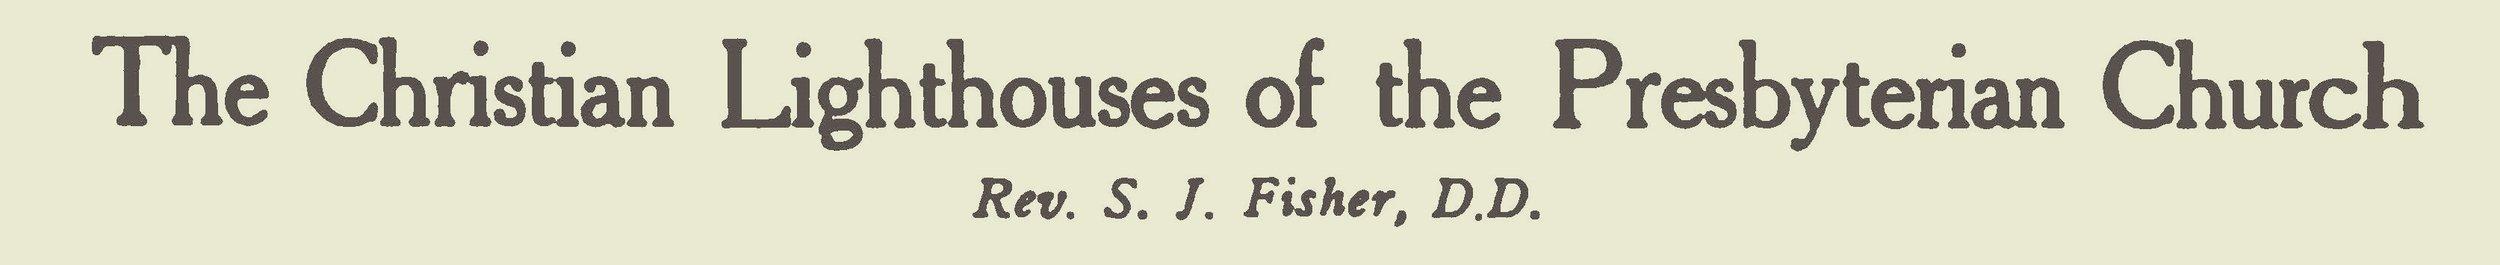 Fisher, Samuel Jackson, The Christian Lighthouses of the Presbyterian Church Title Page.jpg